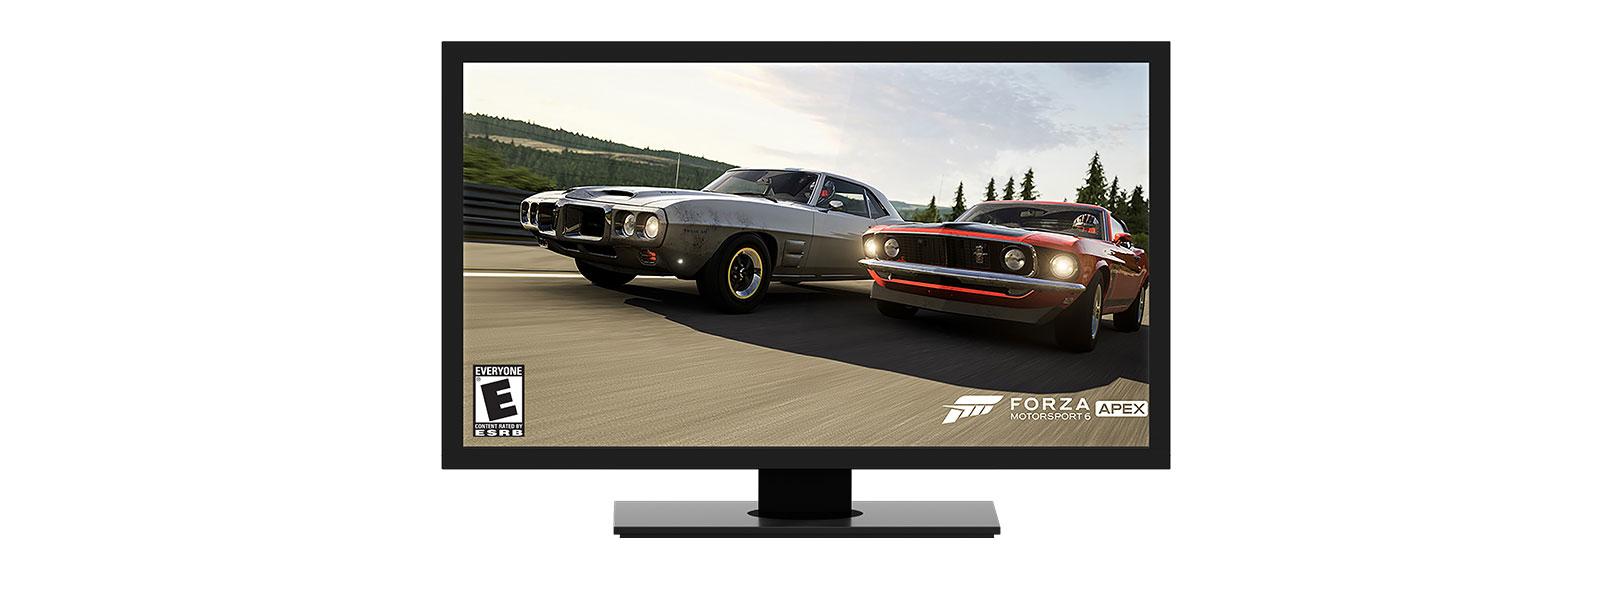 Forza game on Windows desktop